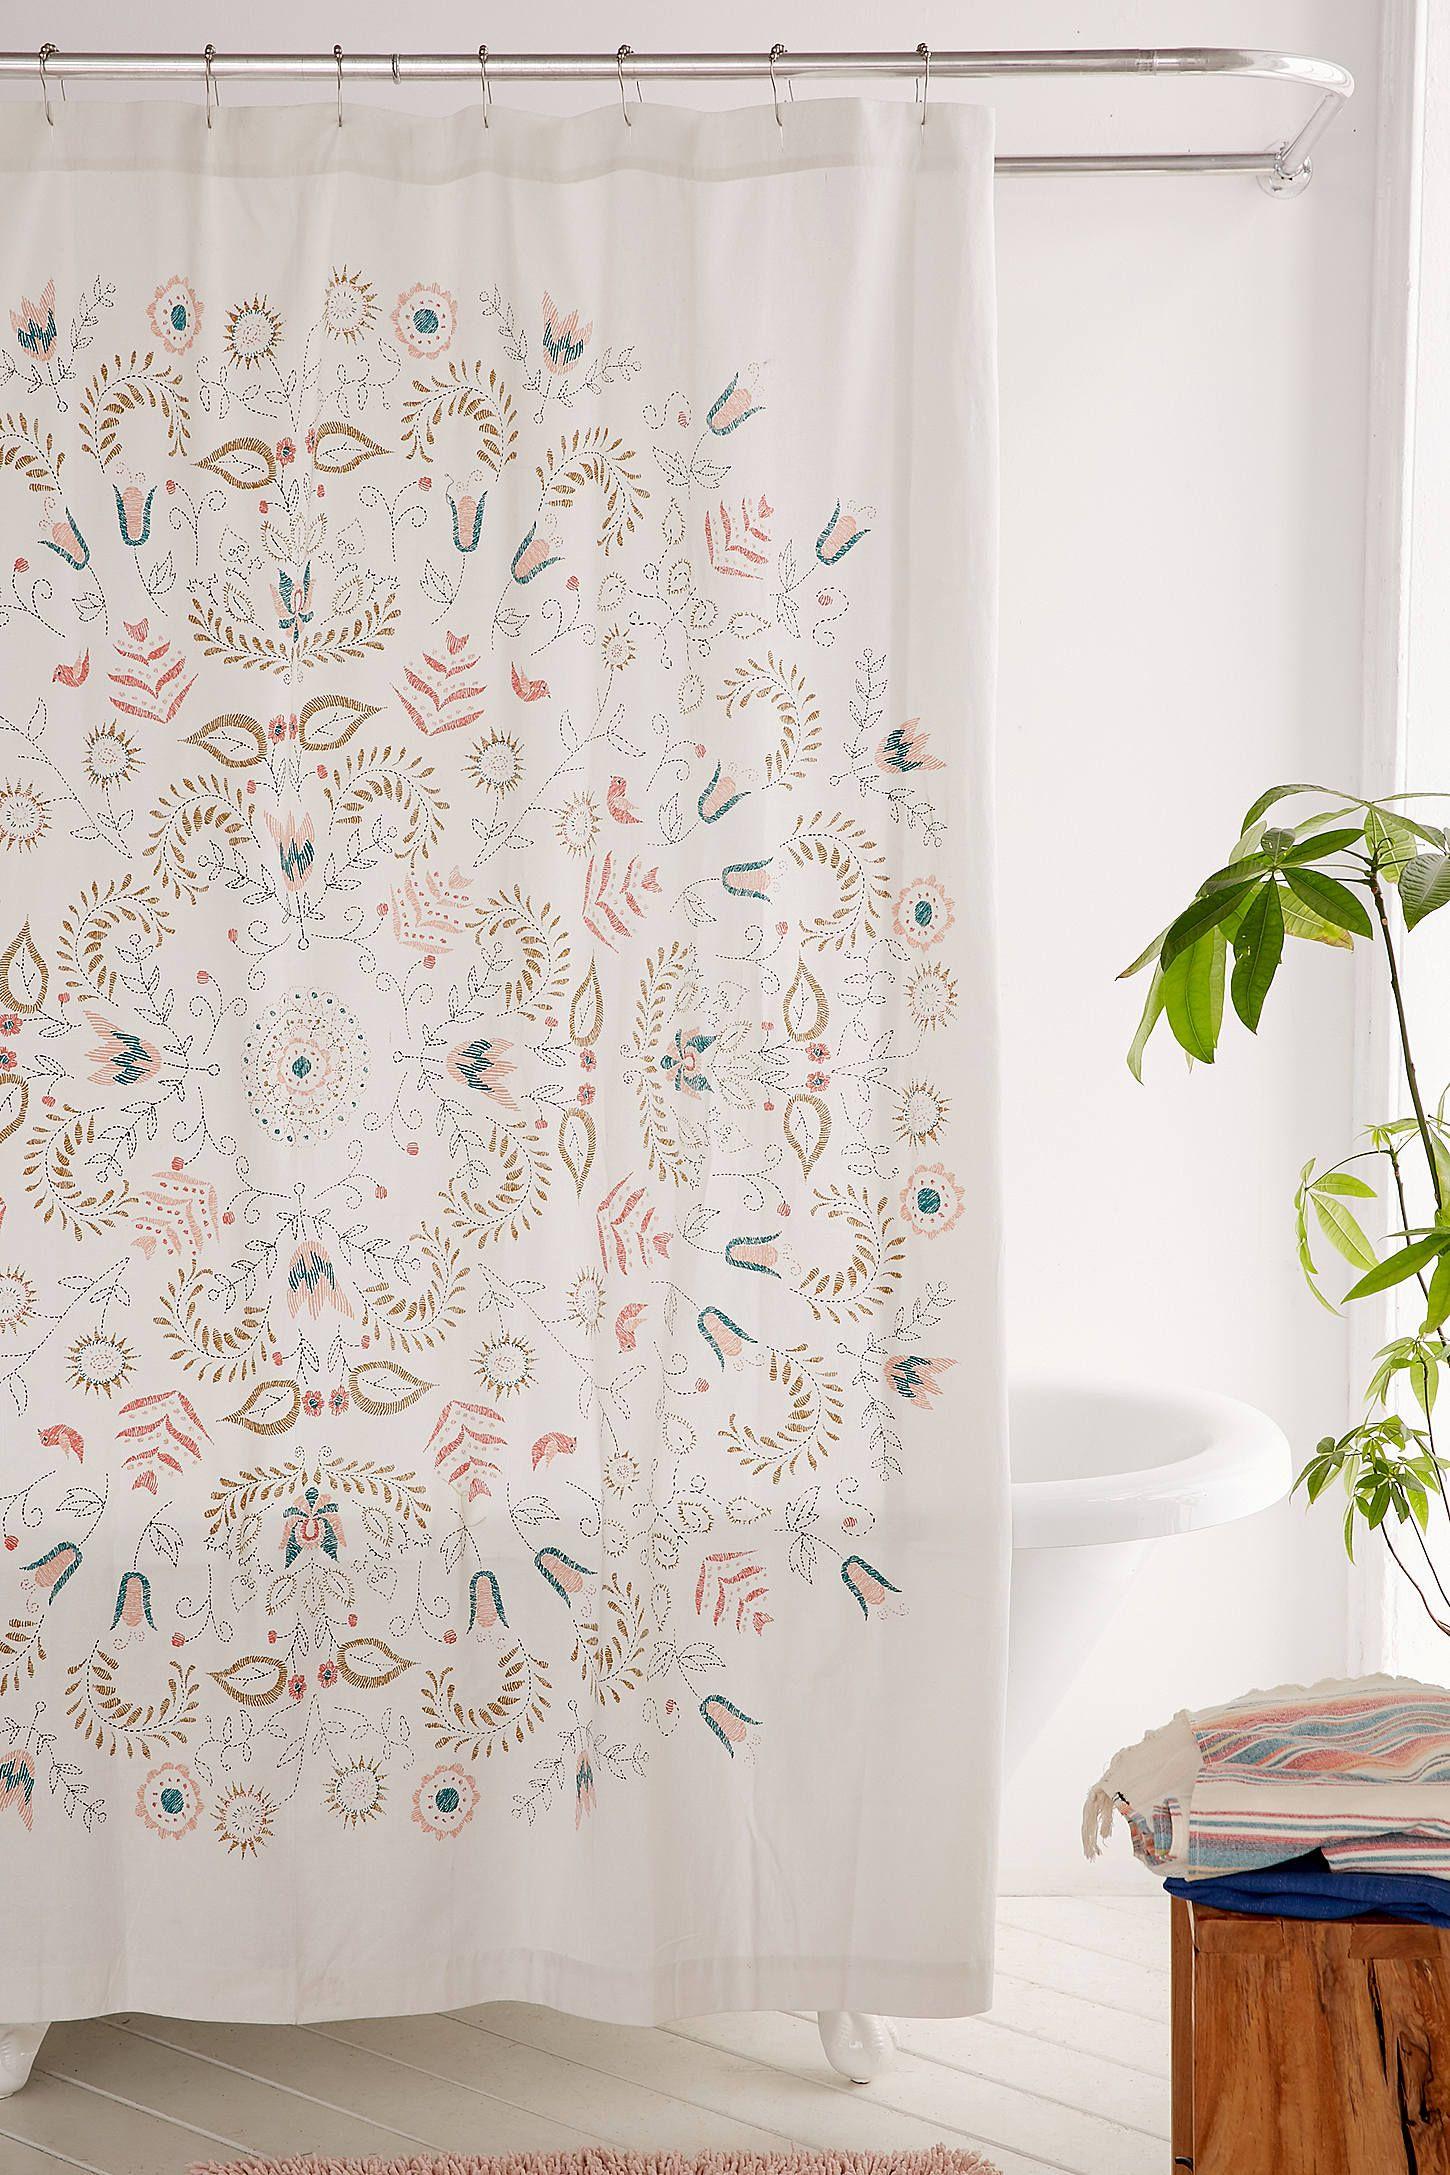 Copper Shower Curtain Hooks Set Pretty Shower Curtains Floral